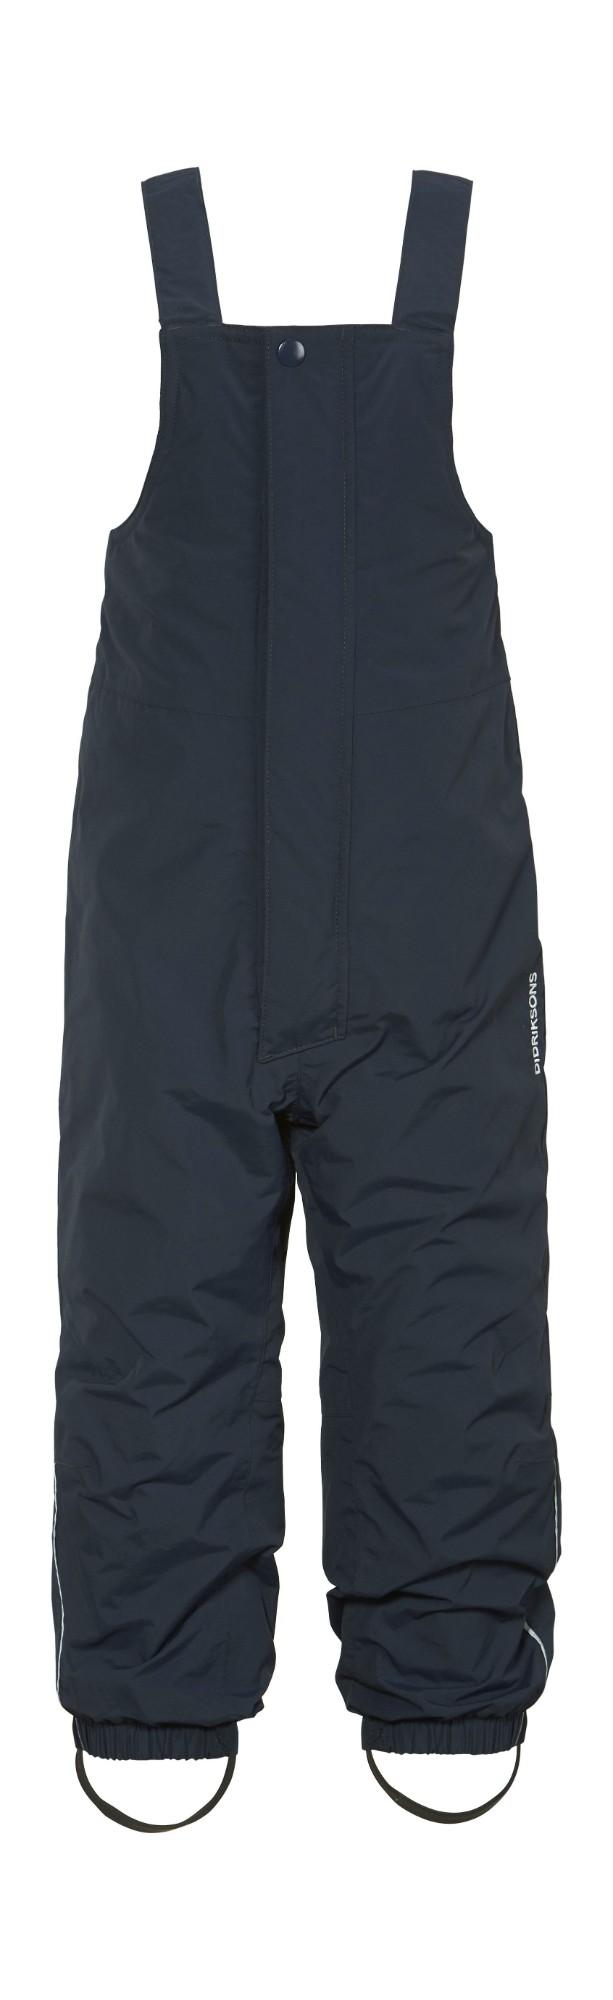 DIDRIKSONS Tarfala Kid's Pants 5 Navy 140